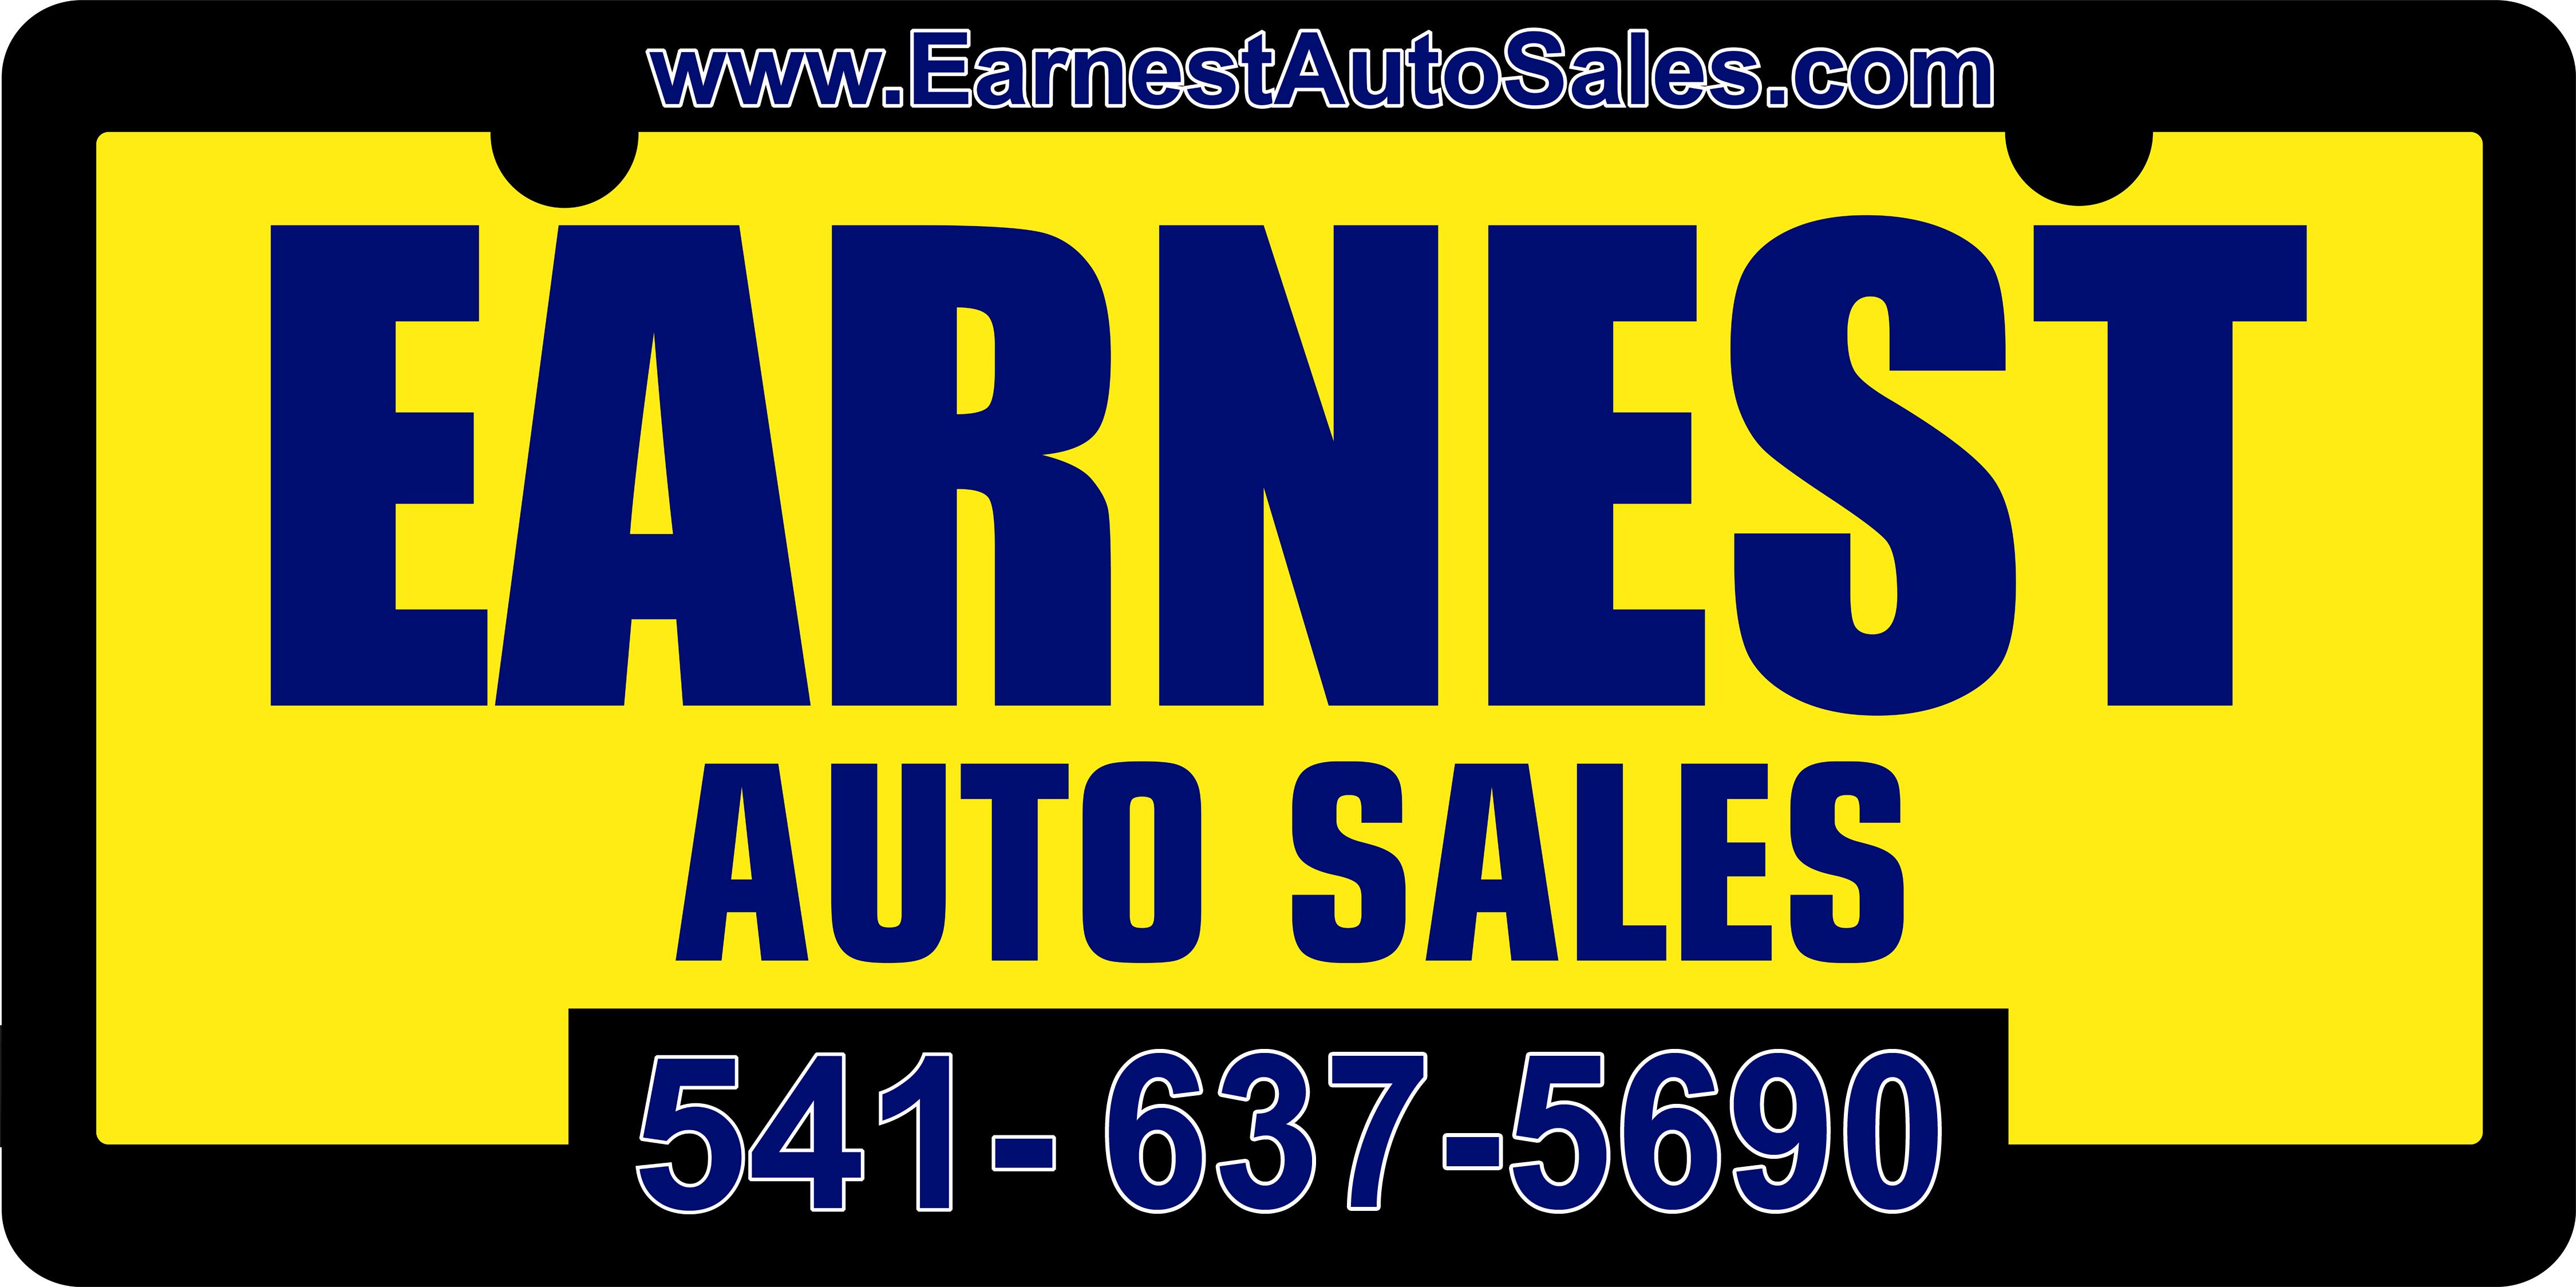 Roseburg jr docs Earnest auro sales Lic